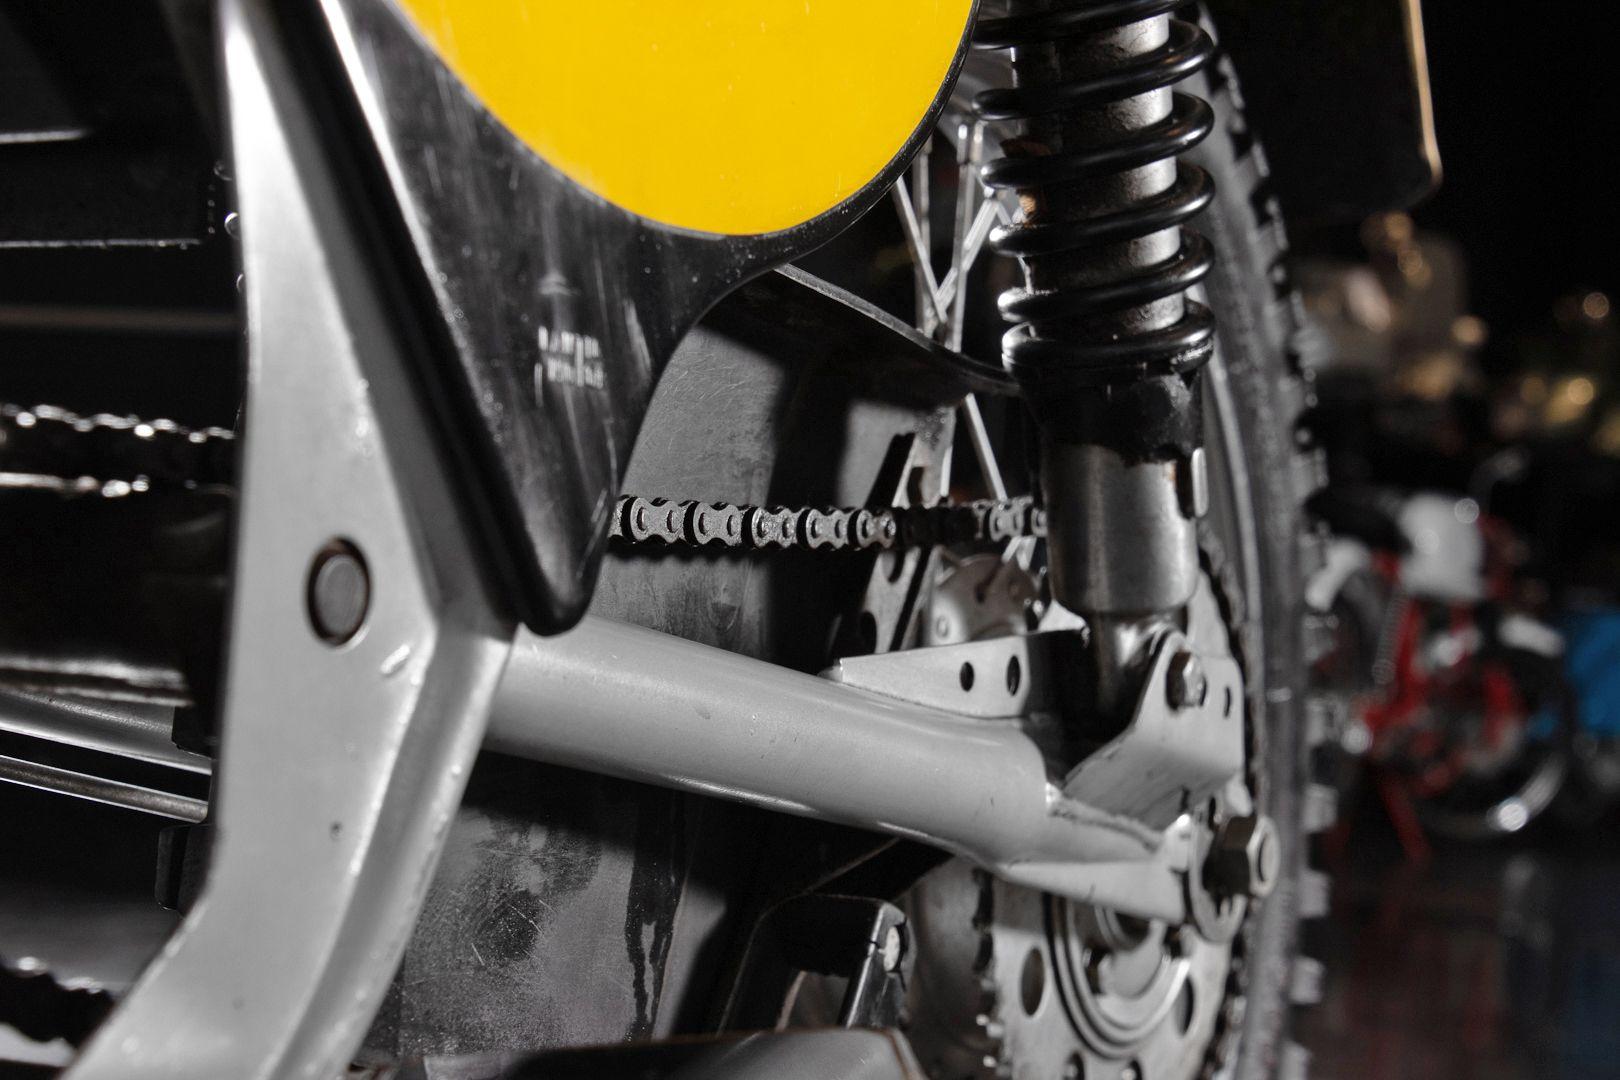 1975 FANTIC MOTOR TX 190 49952